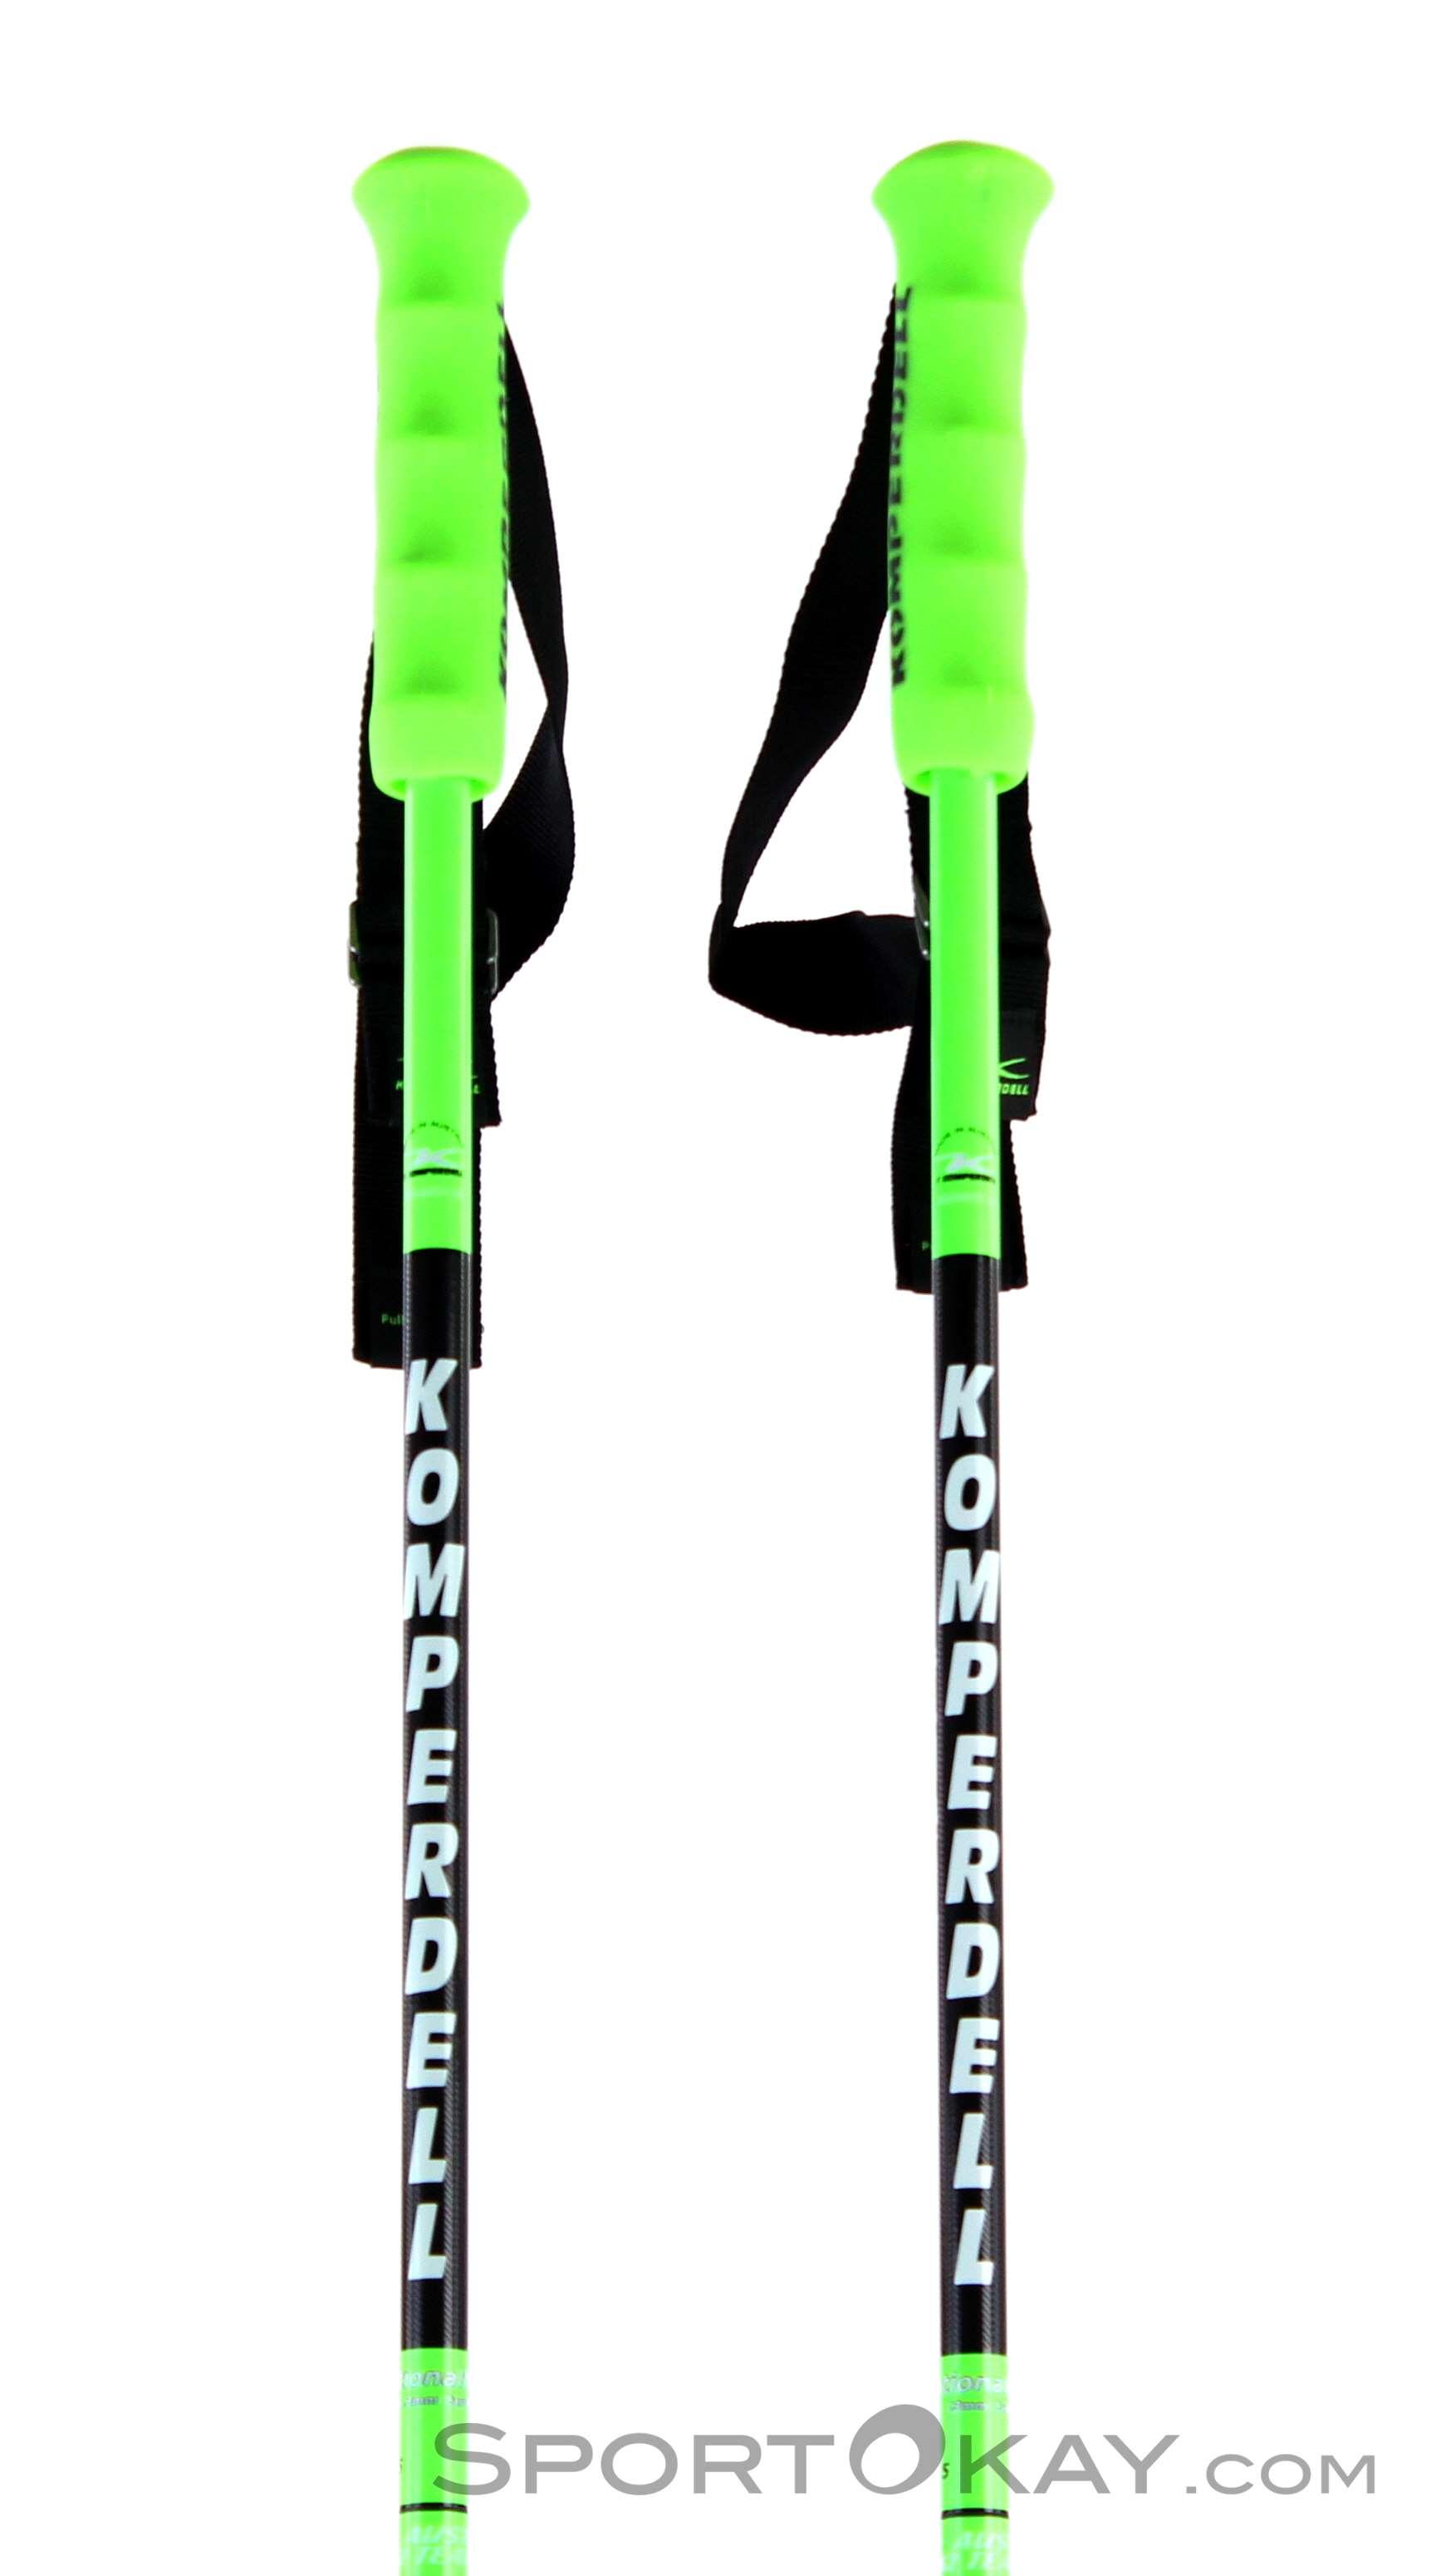 Komperdell Nationalteam Carbon Skistöcke-Grün-130